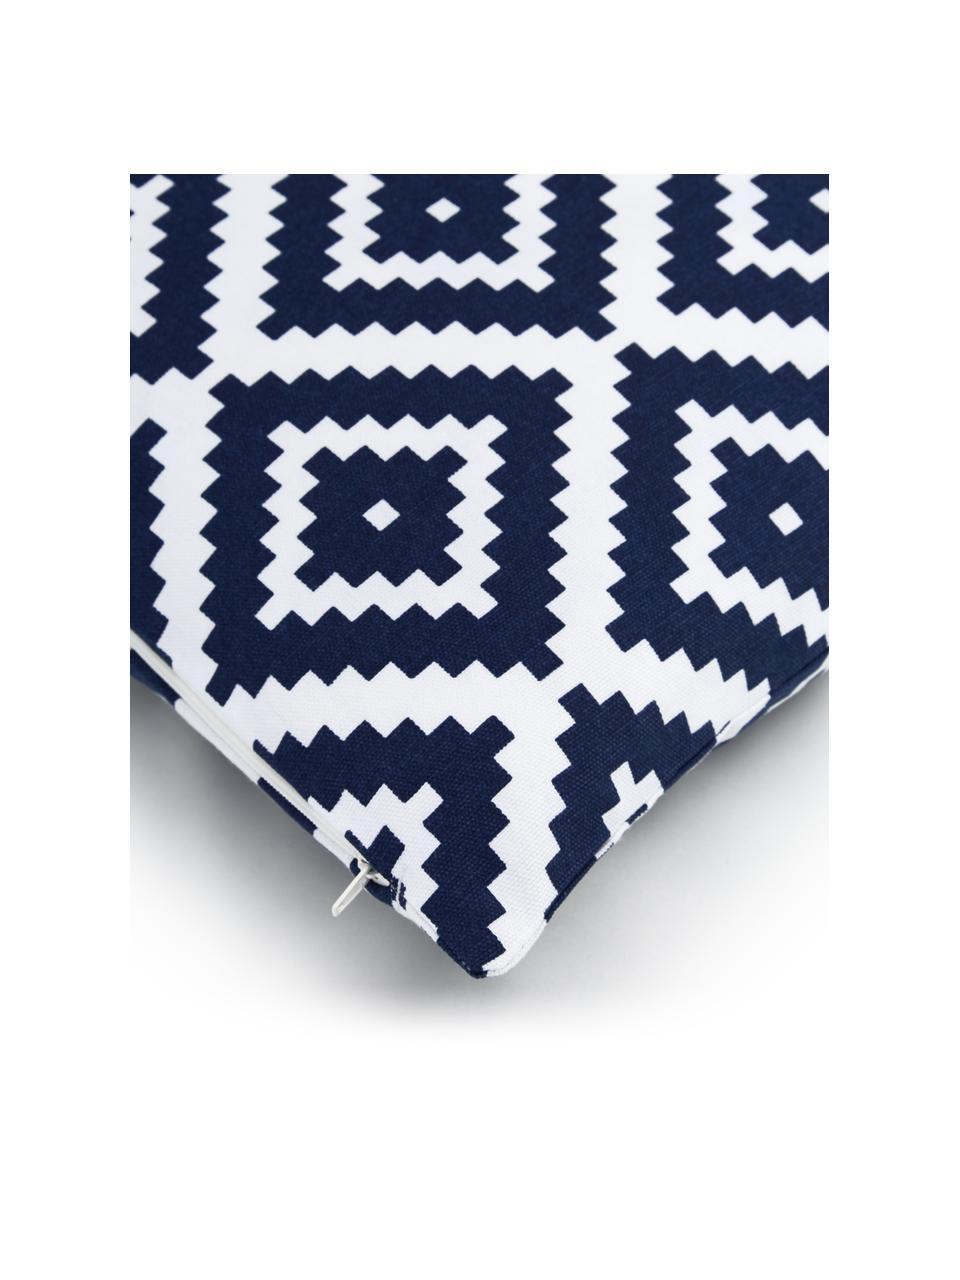 Federa arredo blu scuro/bianco Miami, 100% cotone, Blu, Larg. 45 x Lung. 45 cm